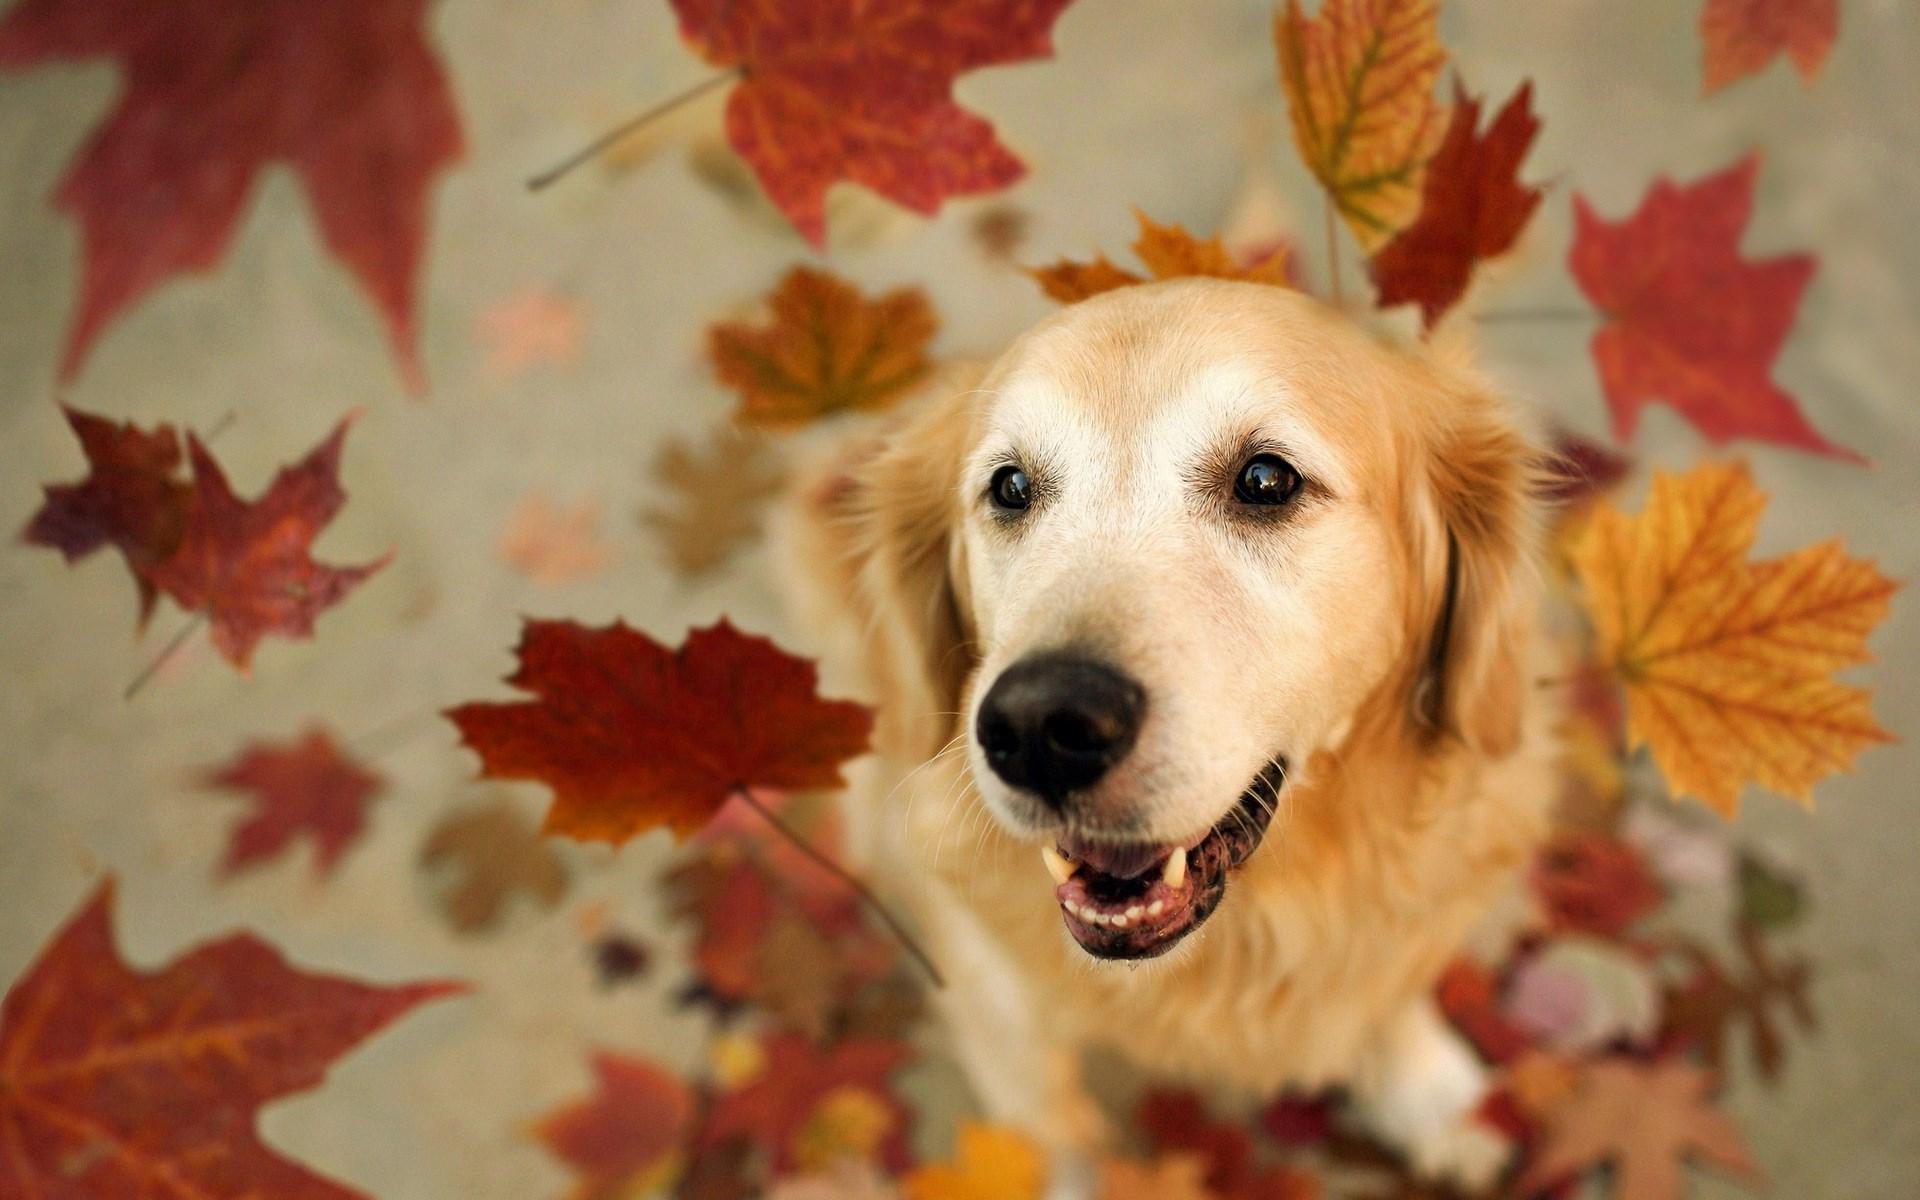 Fall Wallpaper with Dogs - WallpaperSafari